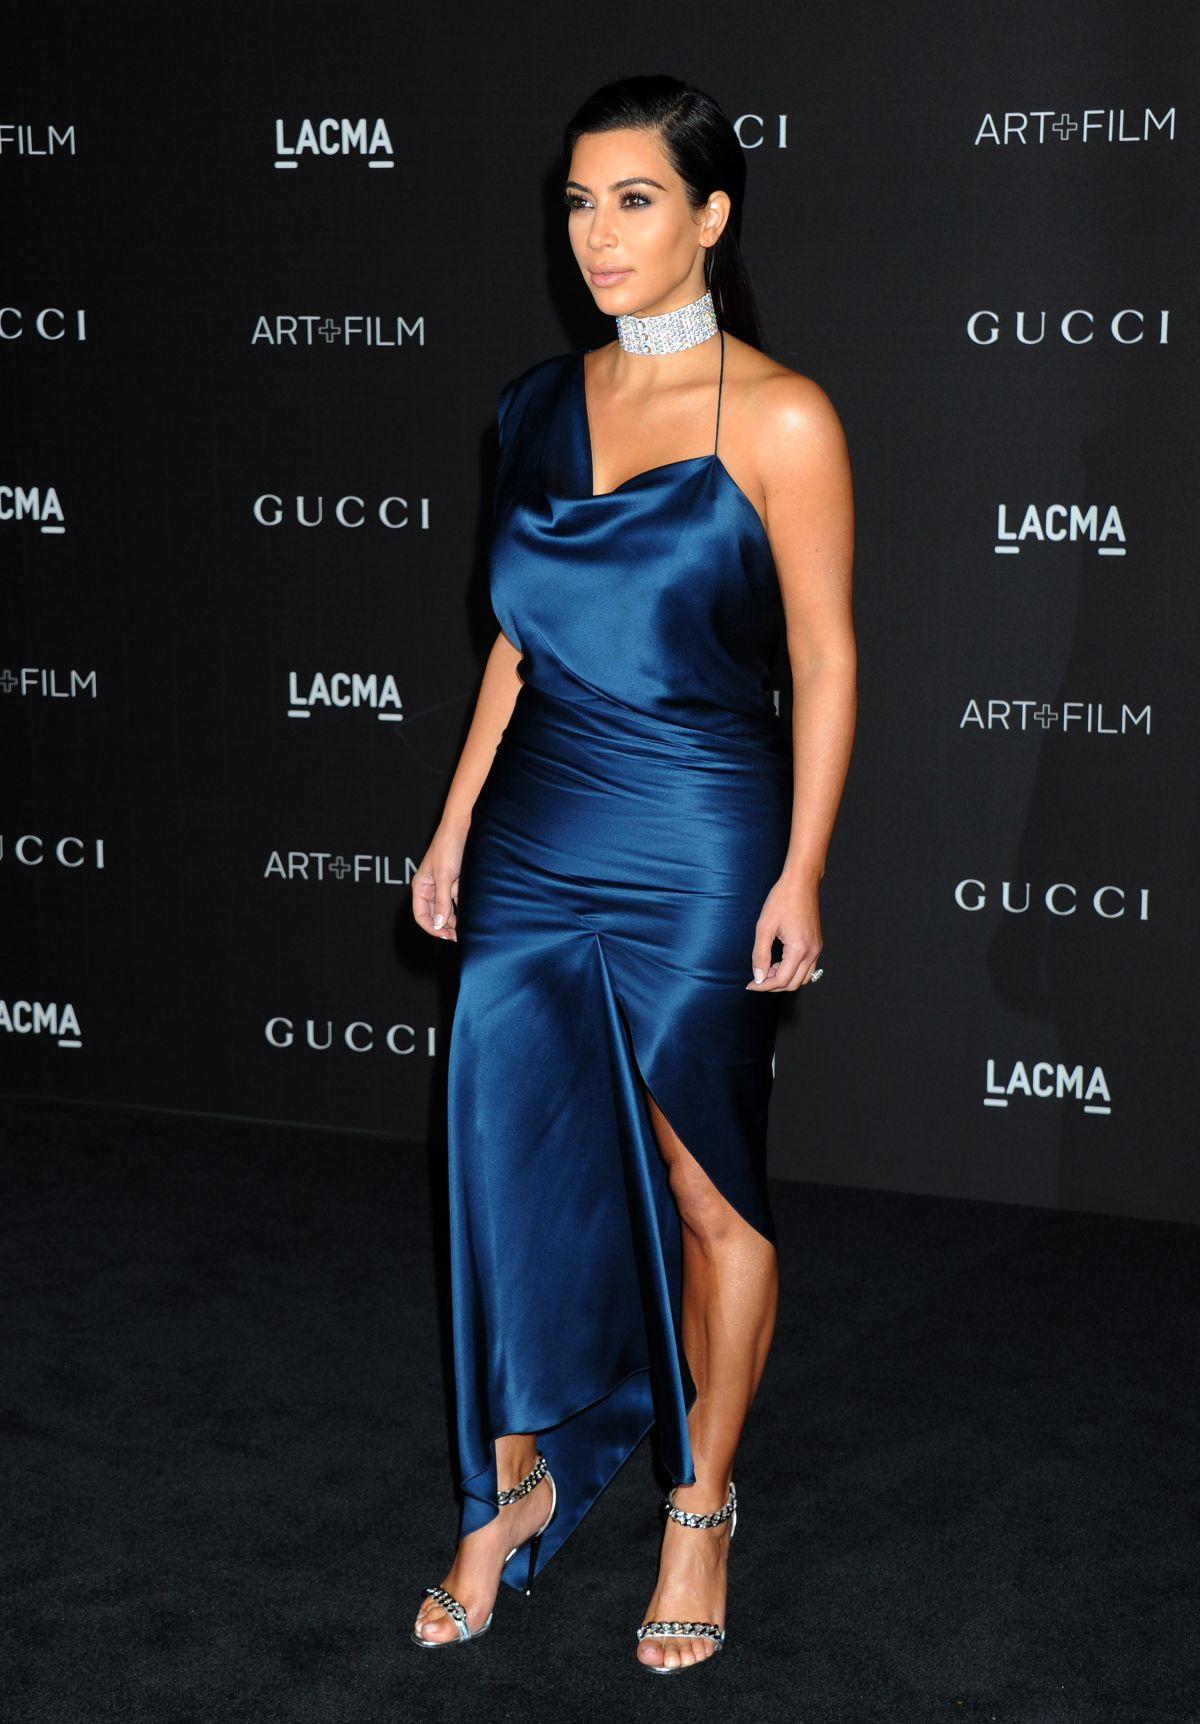 KIM KARDASHIAN at 2014 Lacma Art + Film Gala in Los Angeles